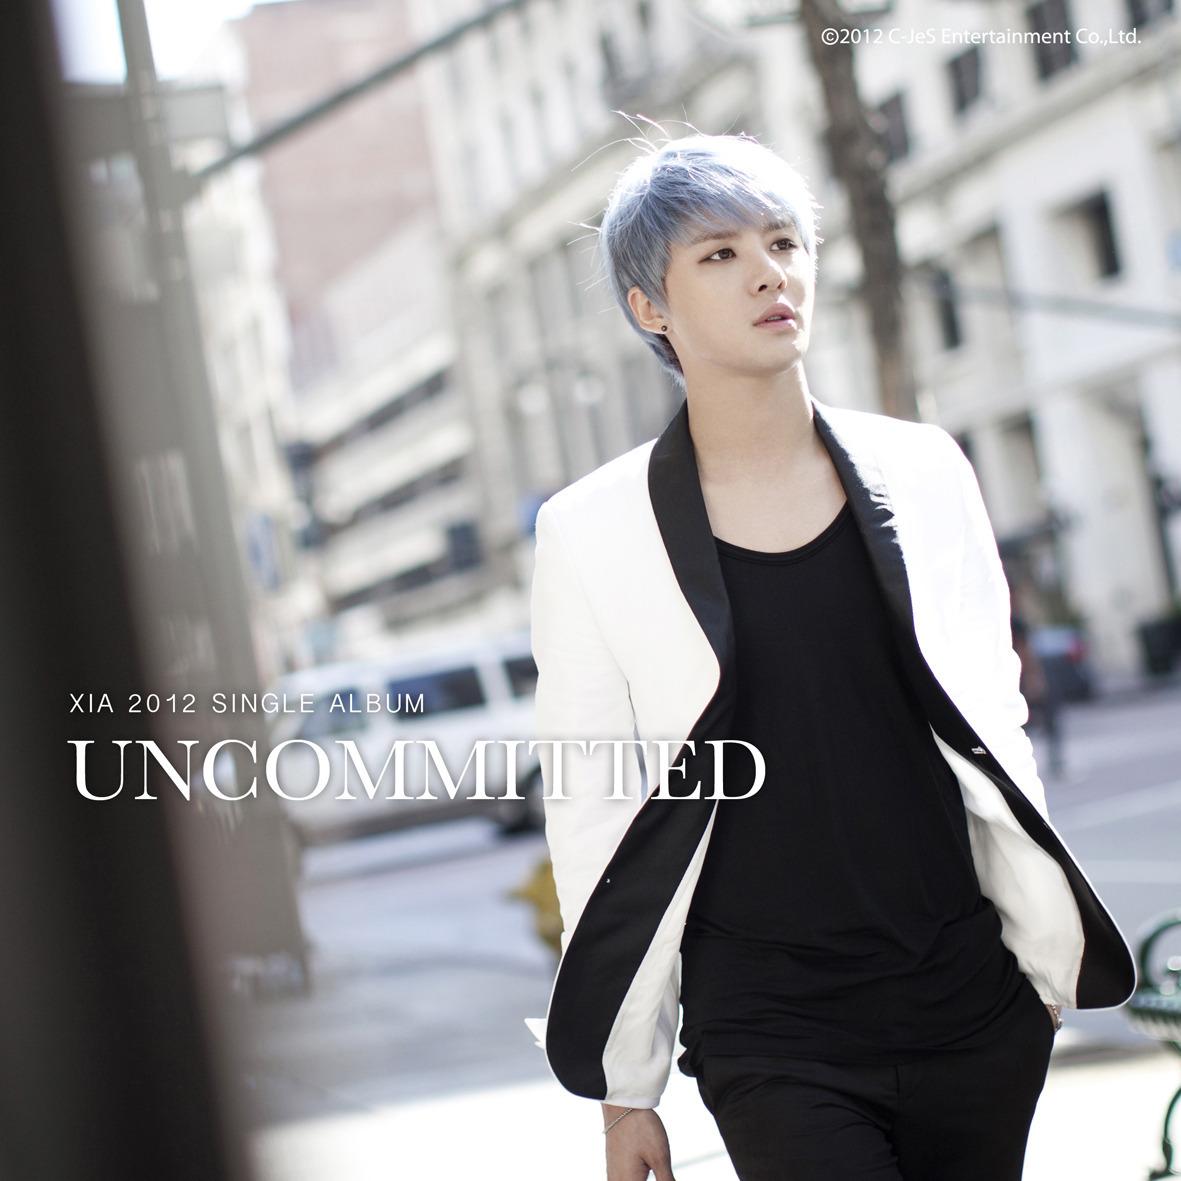 http://3.bp.blogspot.com/-vwYTFefsJ_A/UDLxI1m6GsI/AAAAAAAAMEU/LVIwRuqyRPI/s1600/Junsu+(XIA)-Uncommitted.jpg